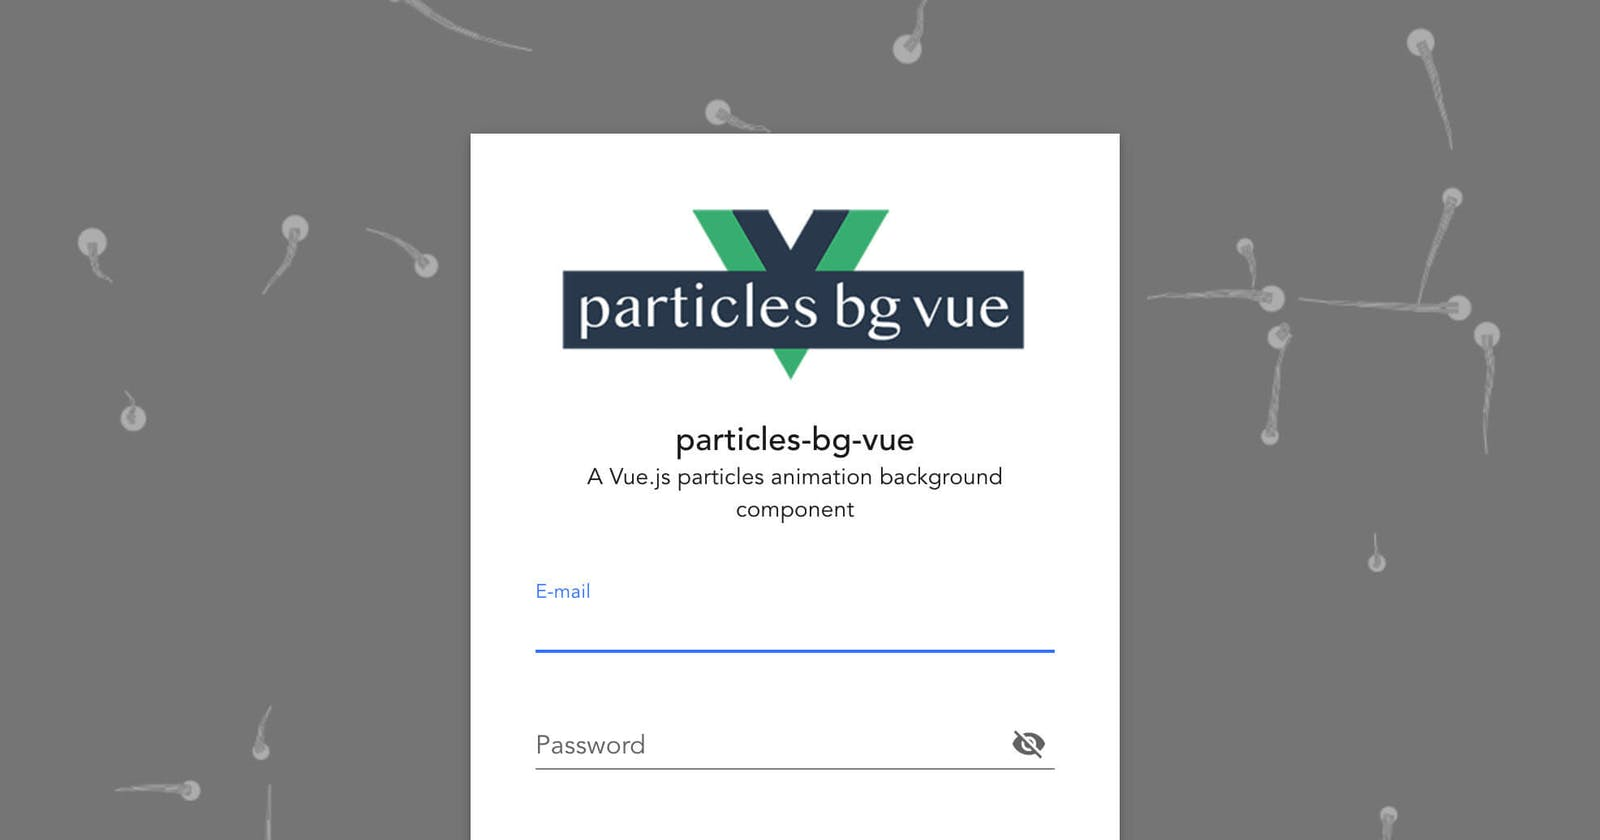 Using particles-bg-vue with Nuxt.js